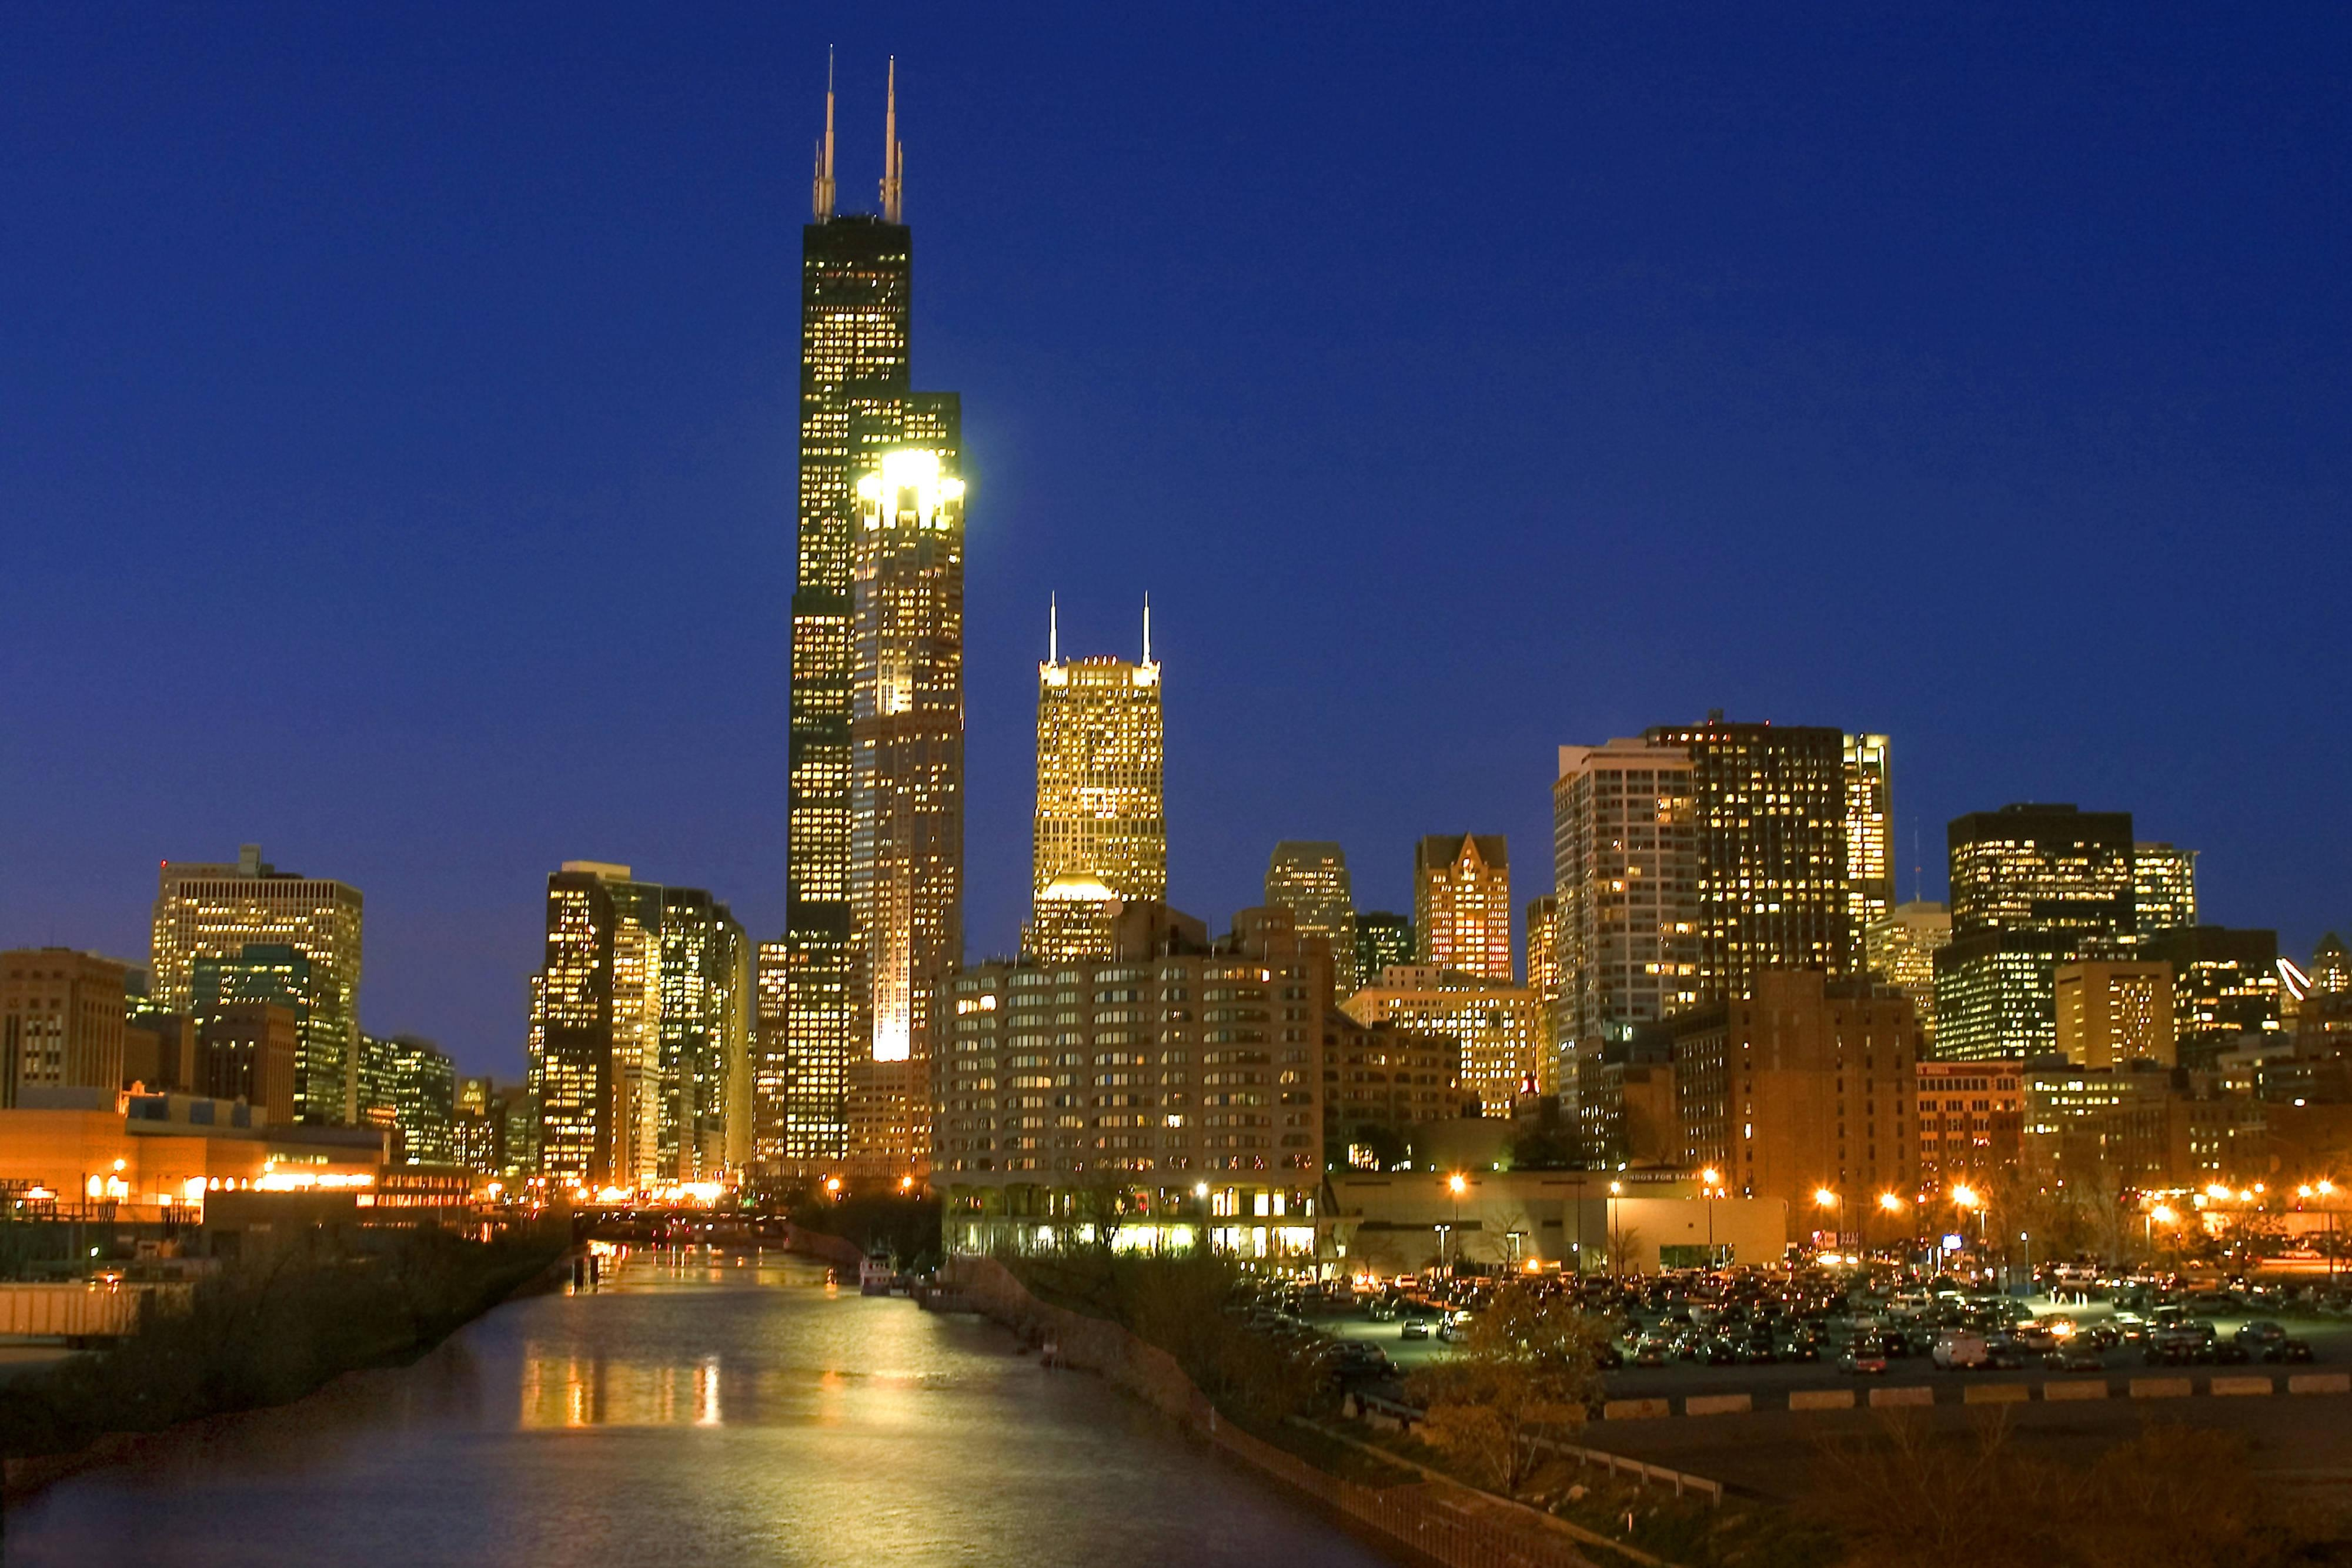 ChicagoSkyline - Night